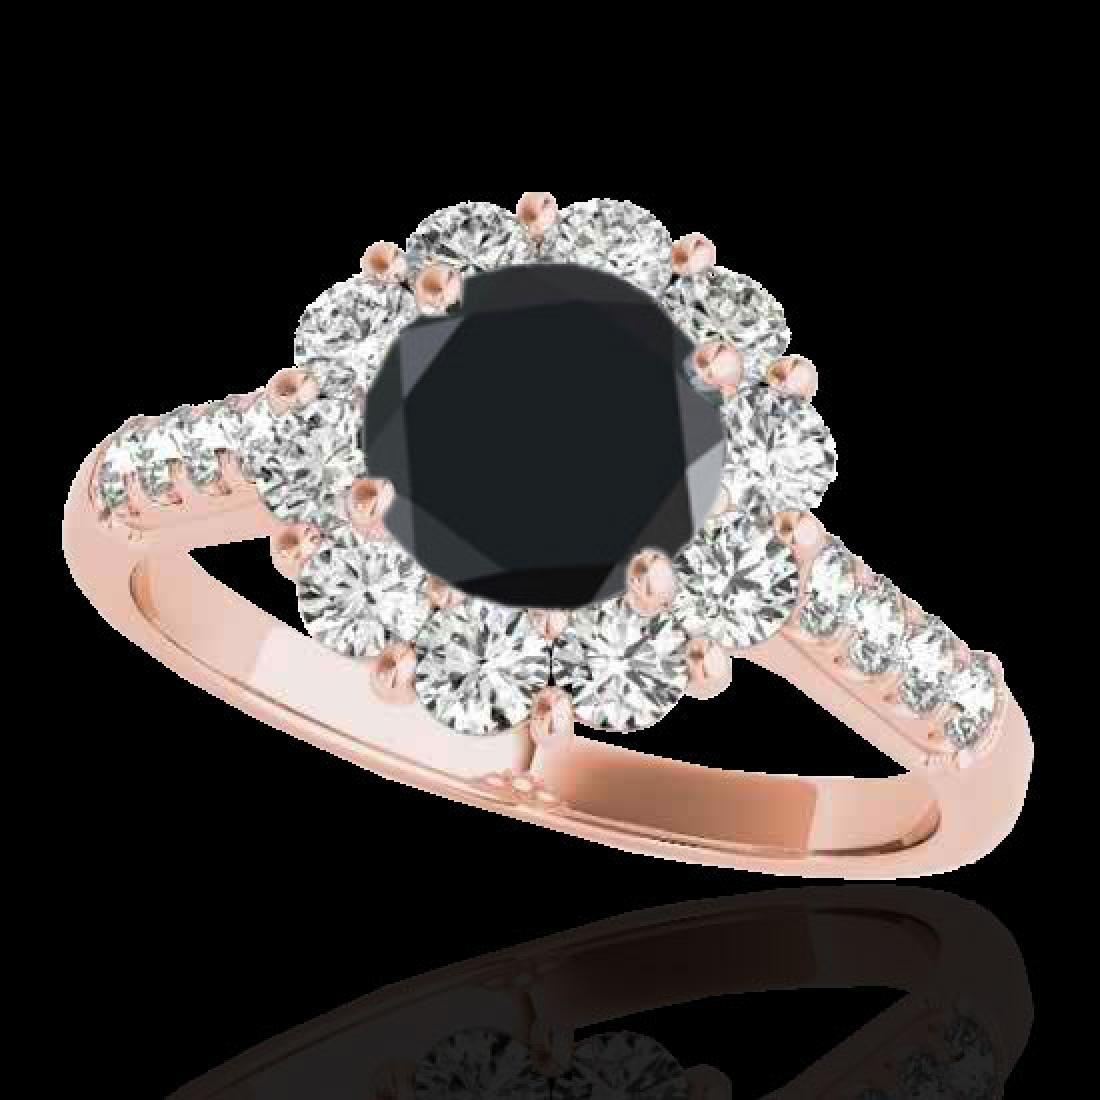 2.75 CTW Certified VS Black Diamond Solitaire Halo Ring